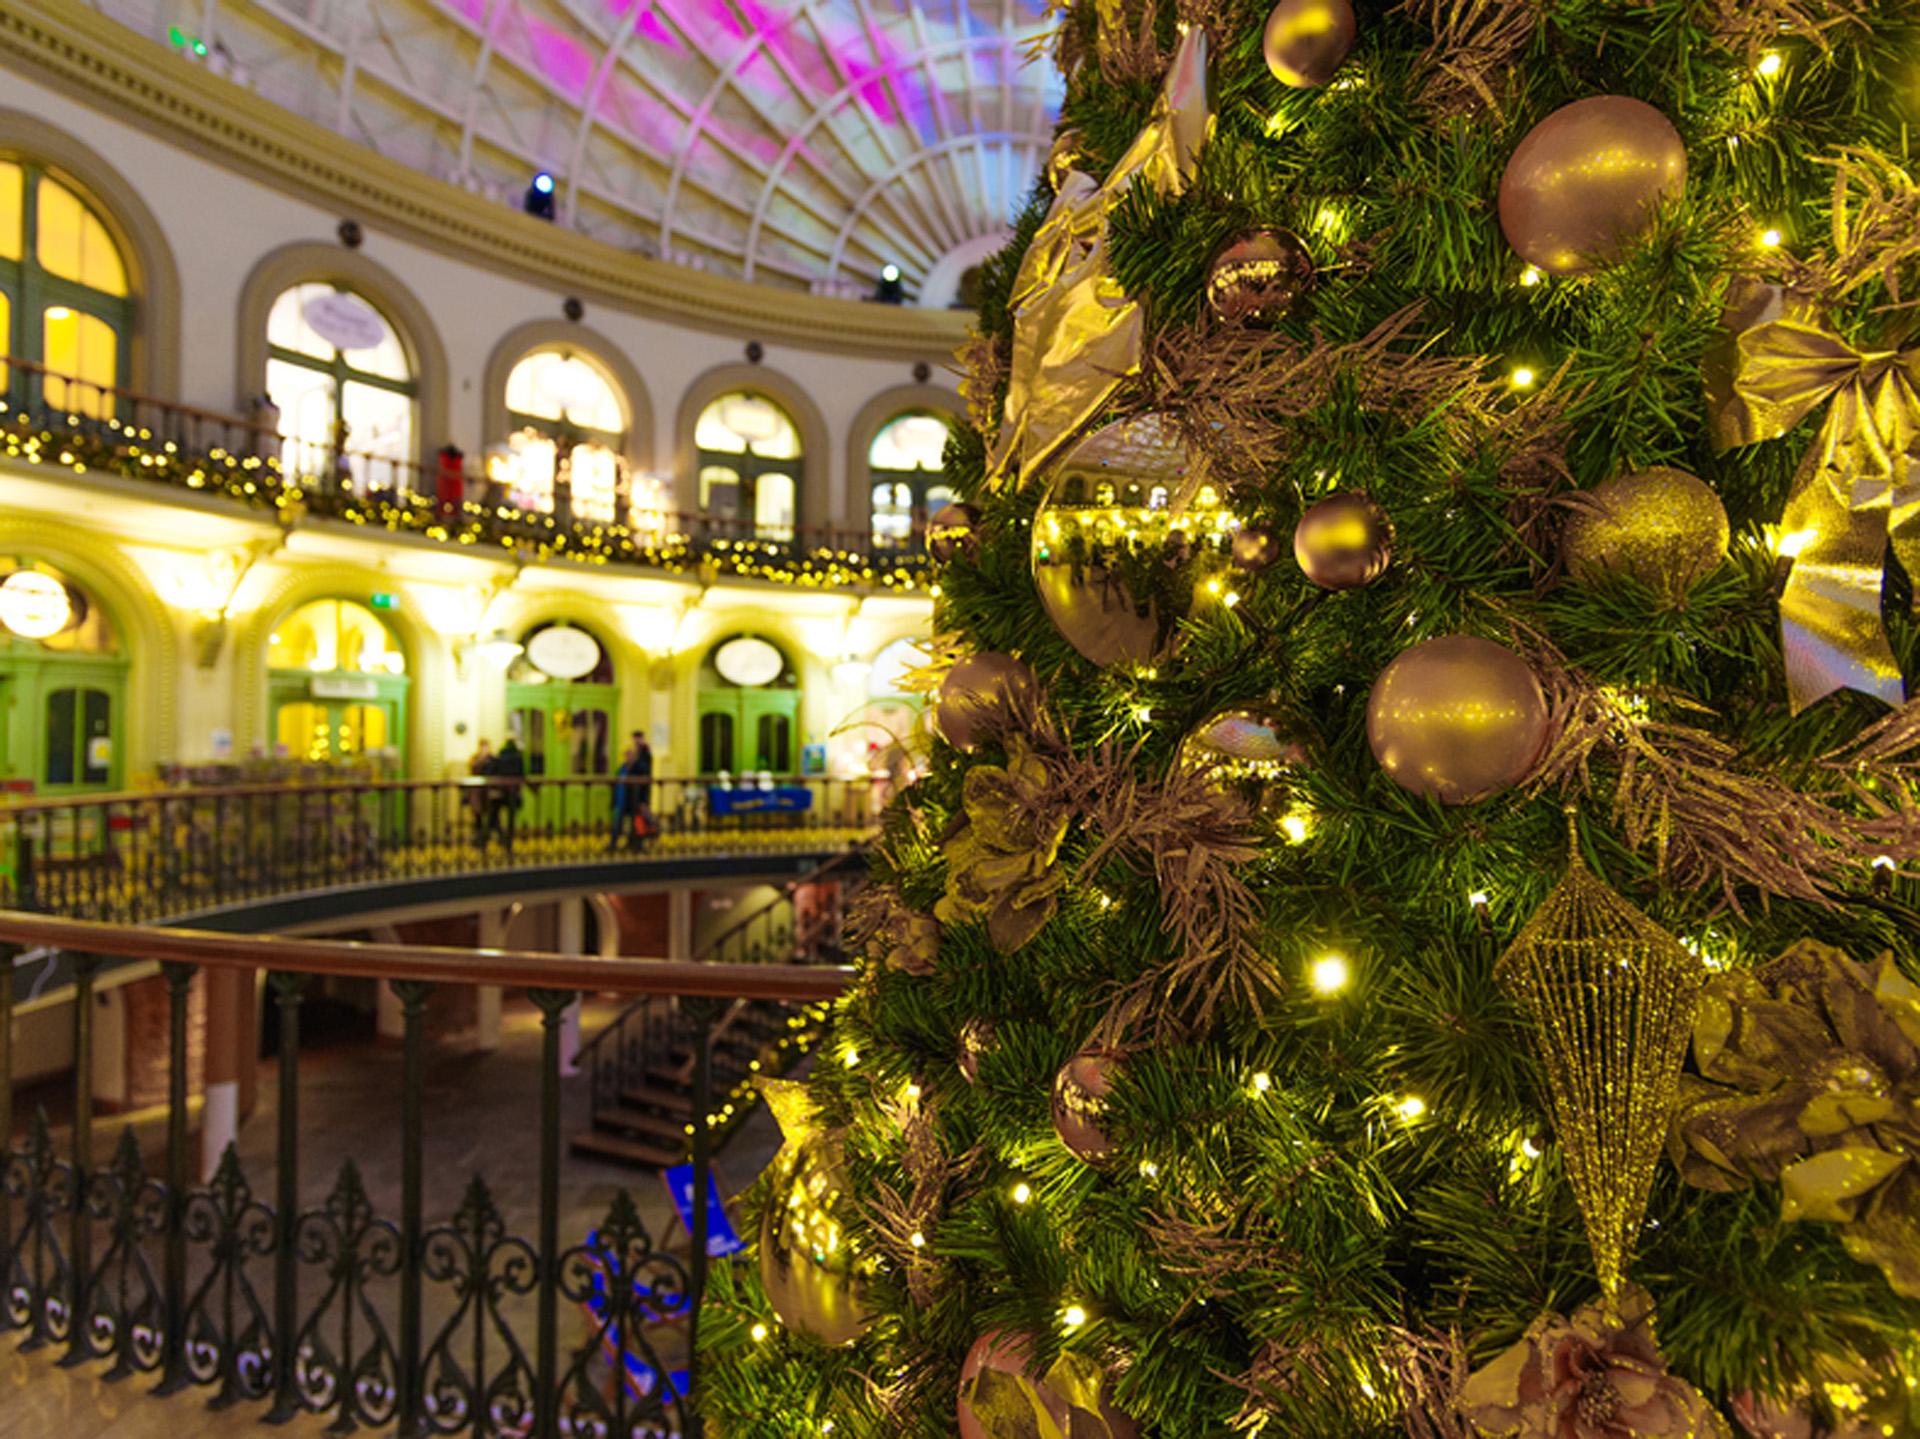 tree christmas giant burbank decorations commercial through sequioa walkthrough products walk trees decor